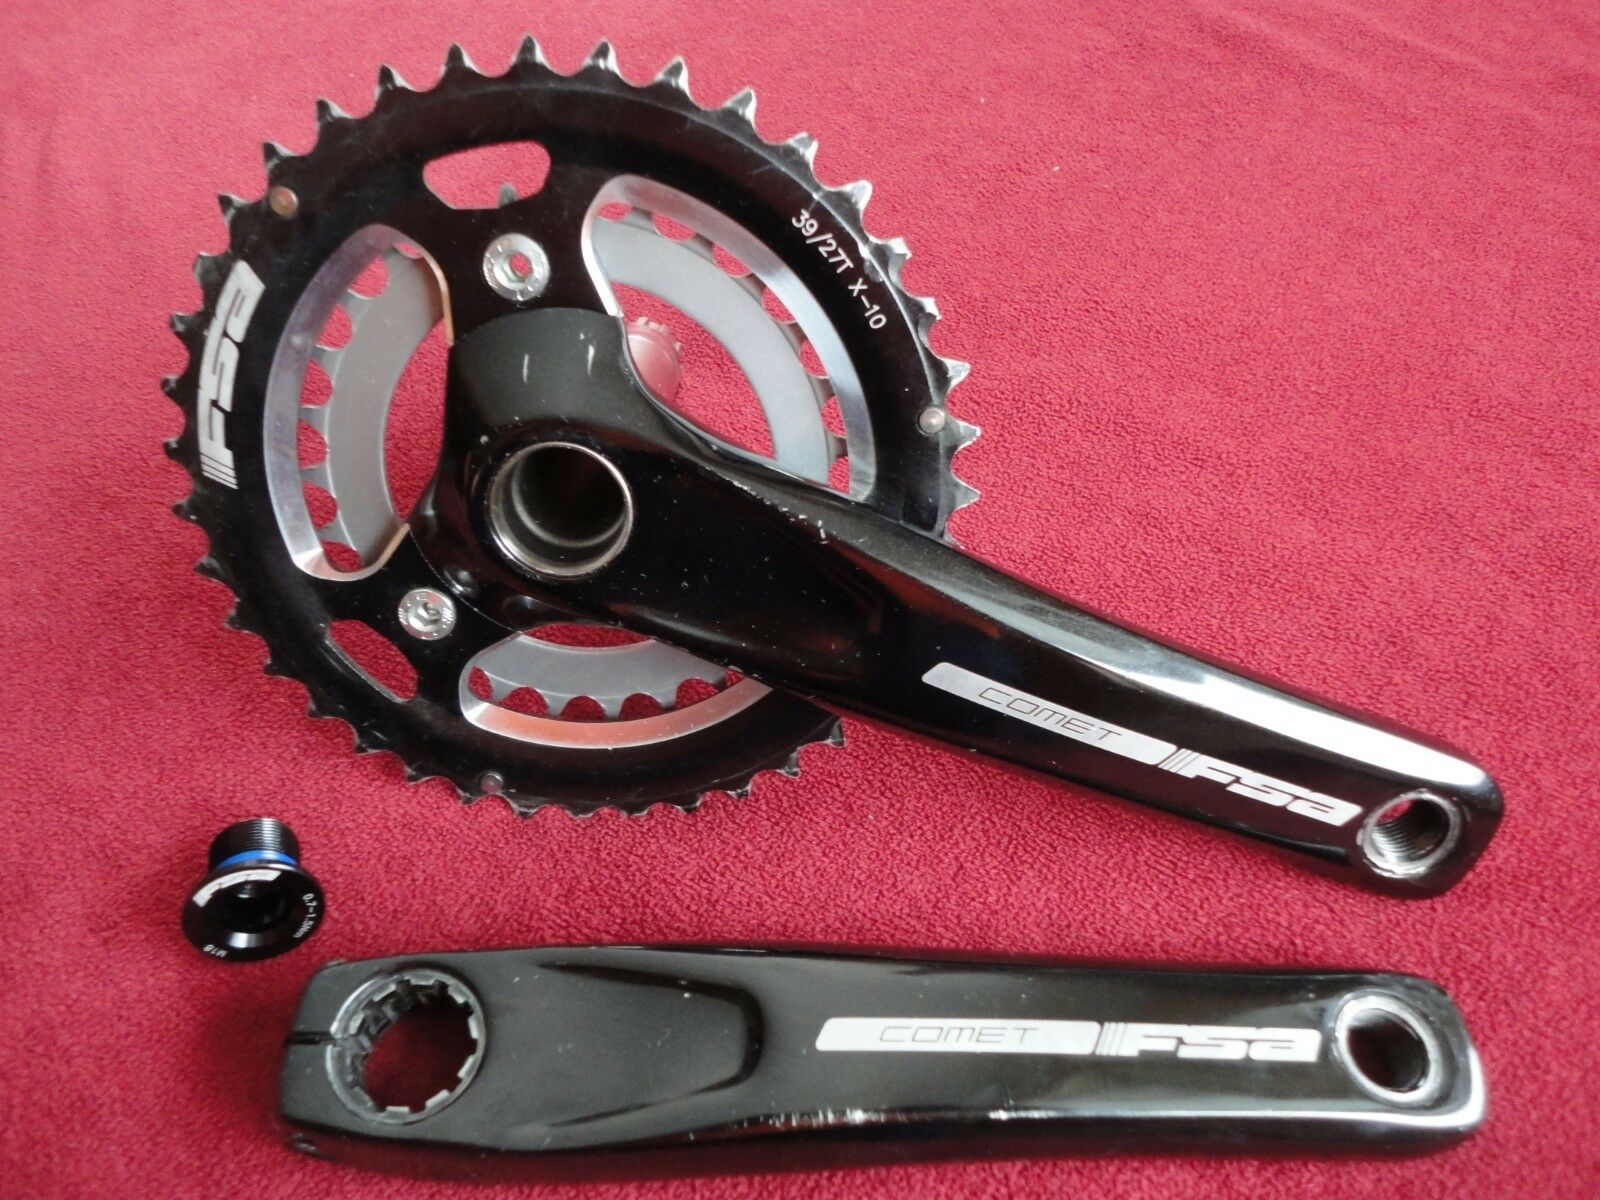 FSA COMET 2 X 10 Velocidad Mountain Bike Manivela Conjunto con platos 39 27T longitud 175mm